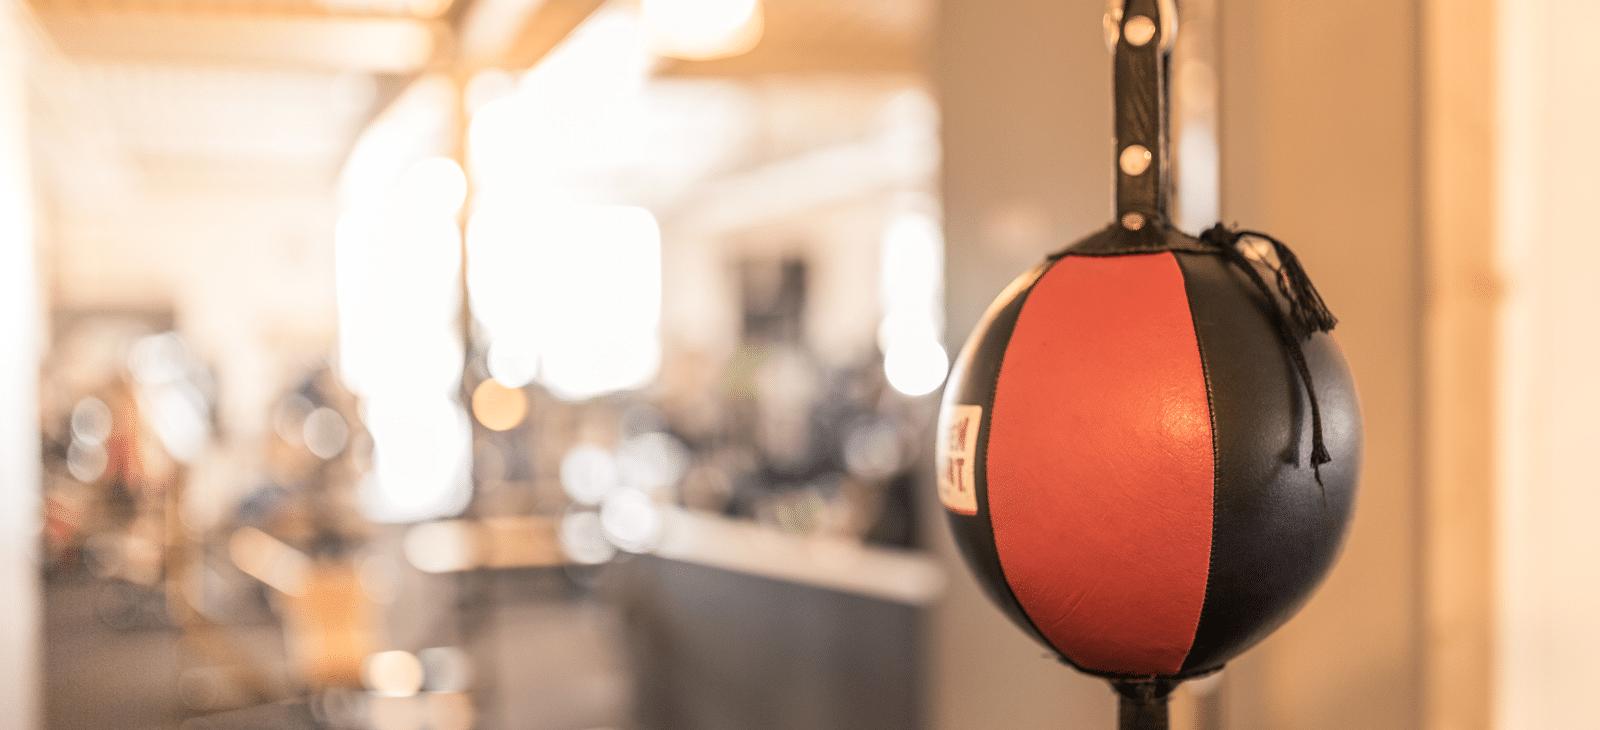 Boxball-Fitness-Loft-1600x730px